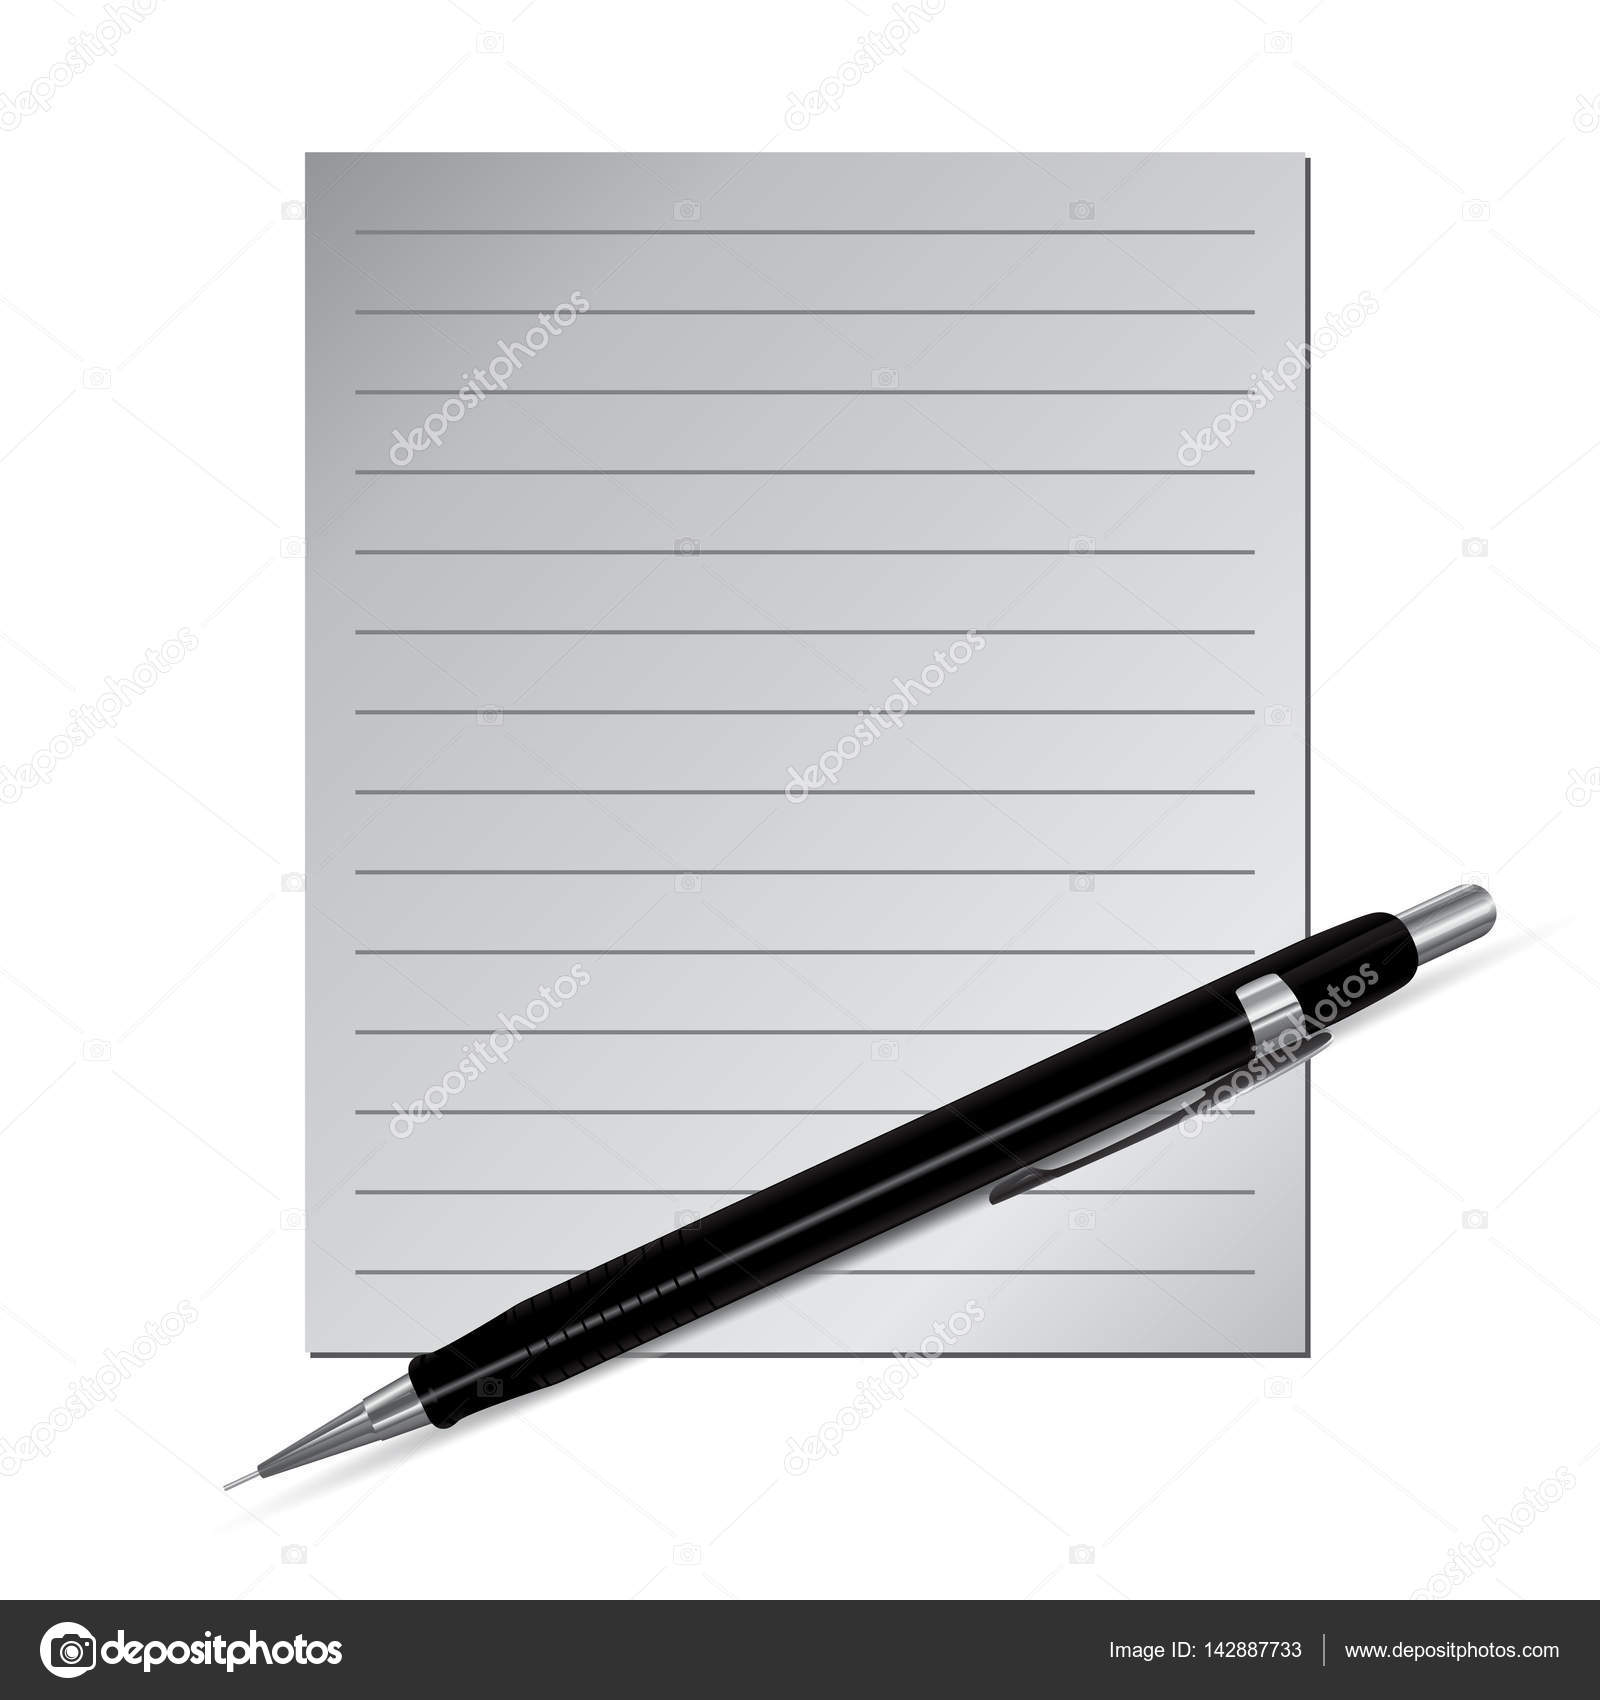 Plantilla vacía de papel rayado con rotulador o lápiz — Vector de ...